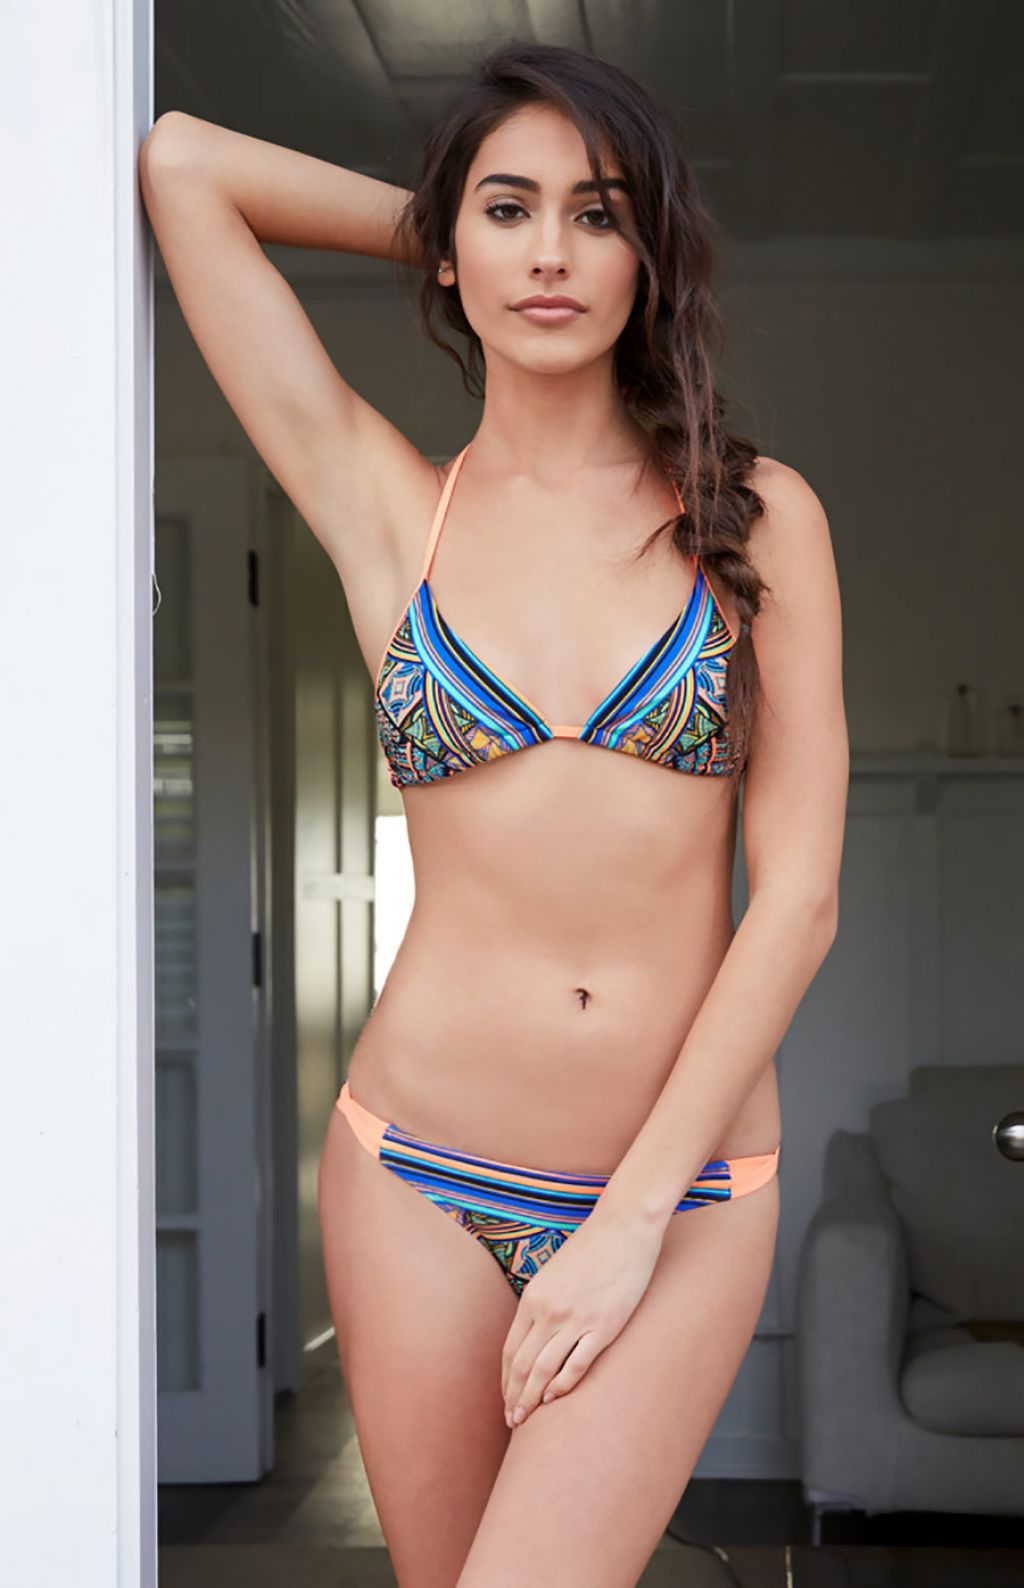 Pictures Taylor Hannum nude (89 photo), Pussy, Bikini, Feet, panties 2019